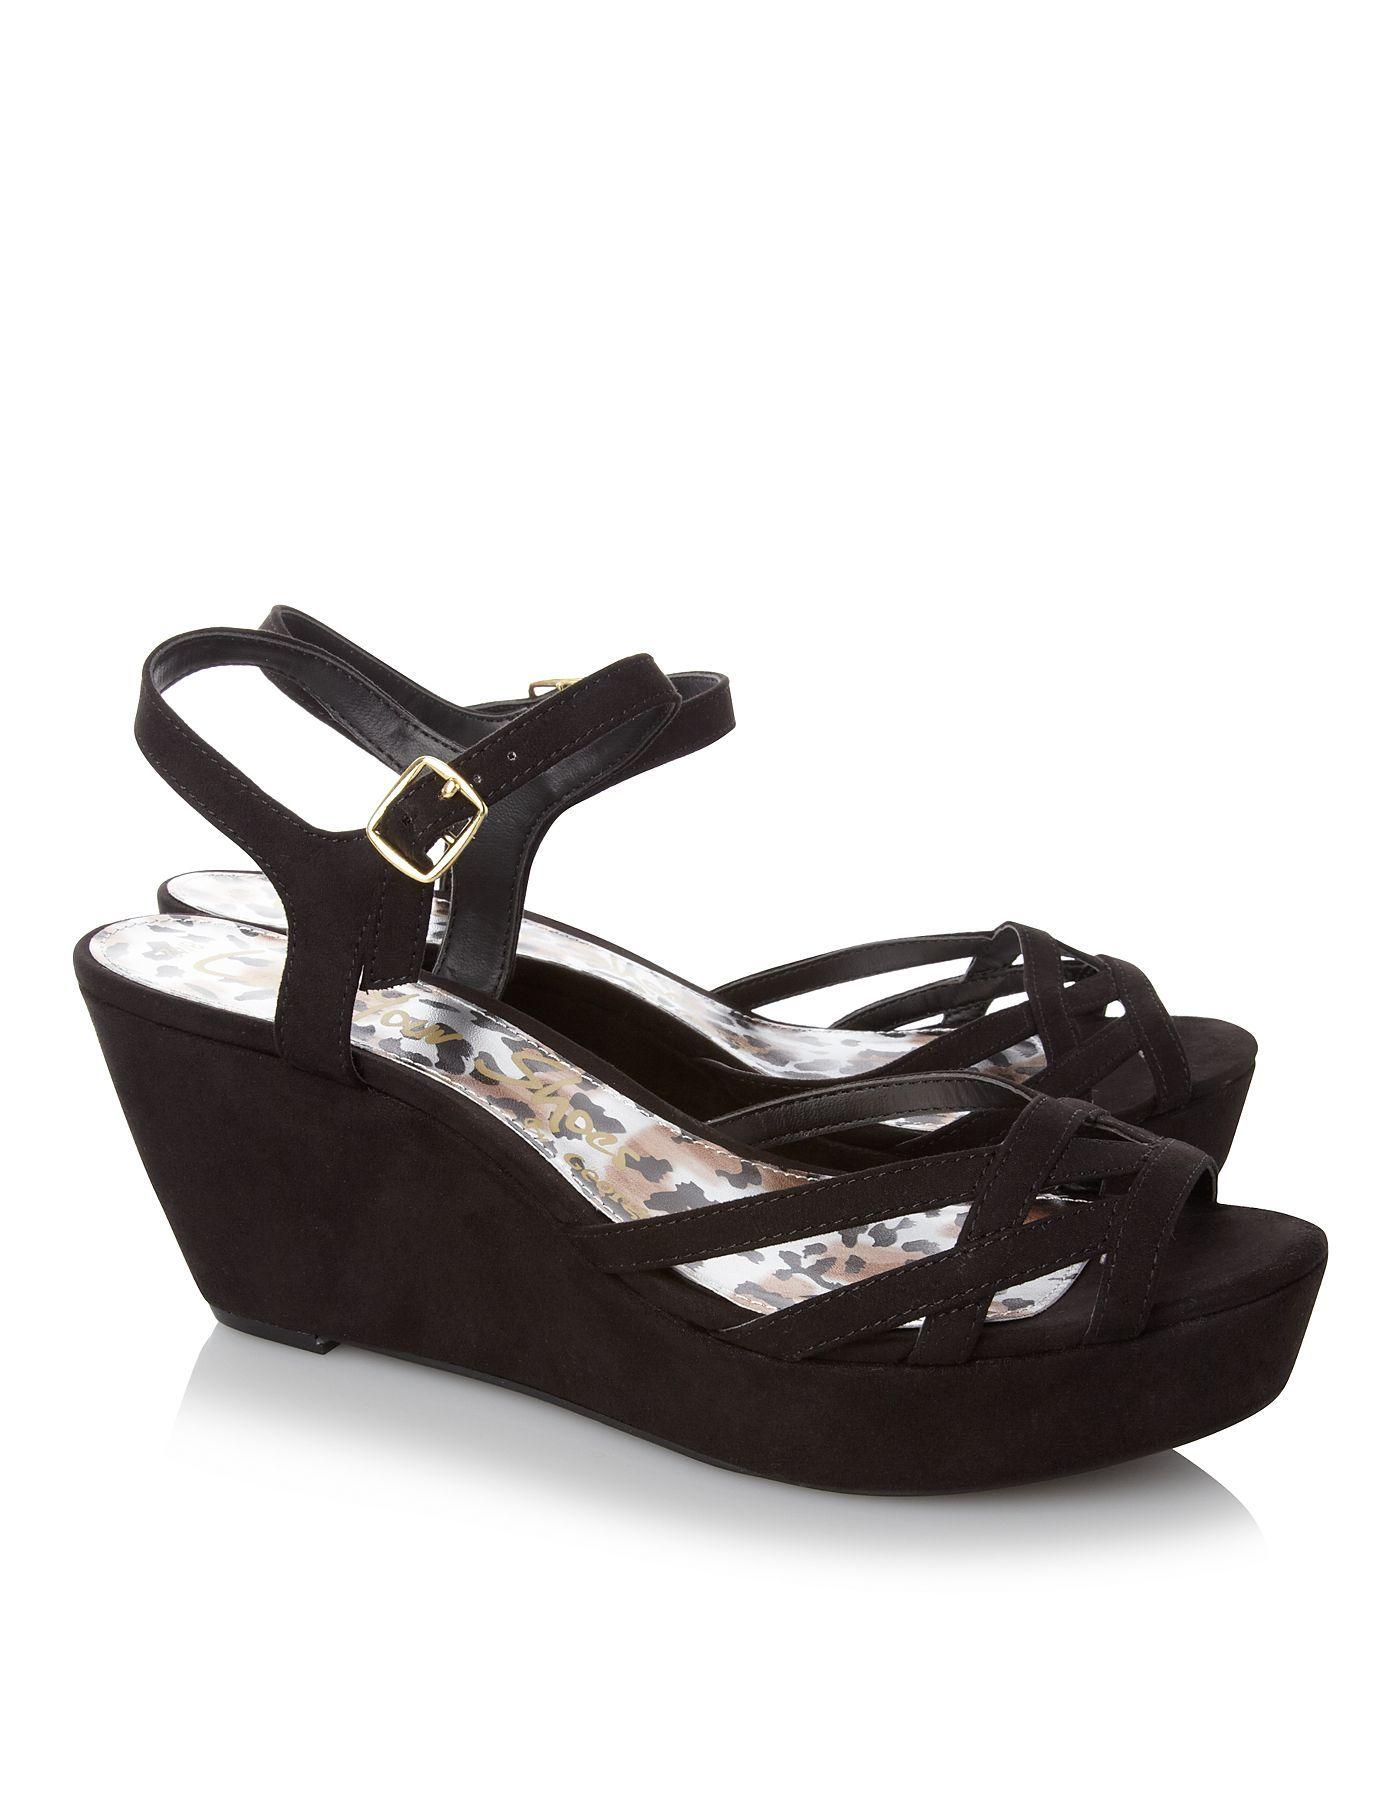 Black sandals asda - Wedged Sandal Women George At Asda